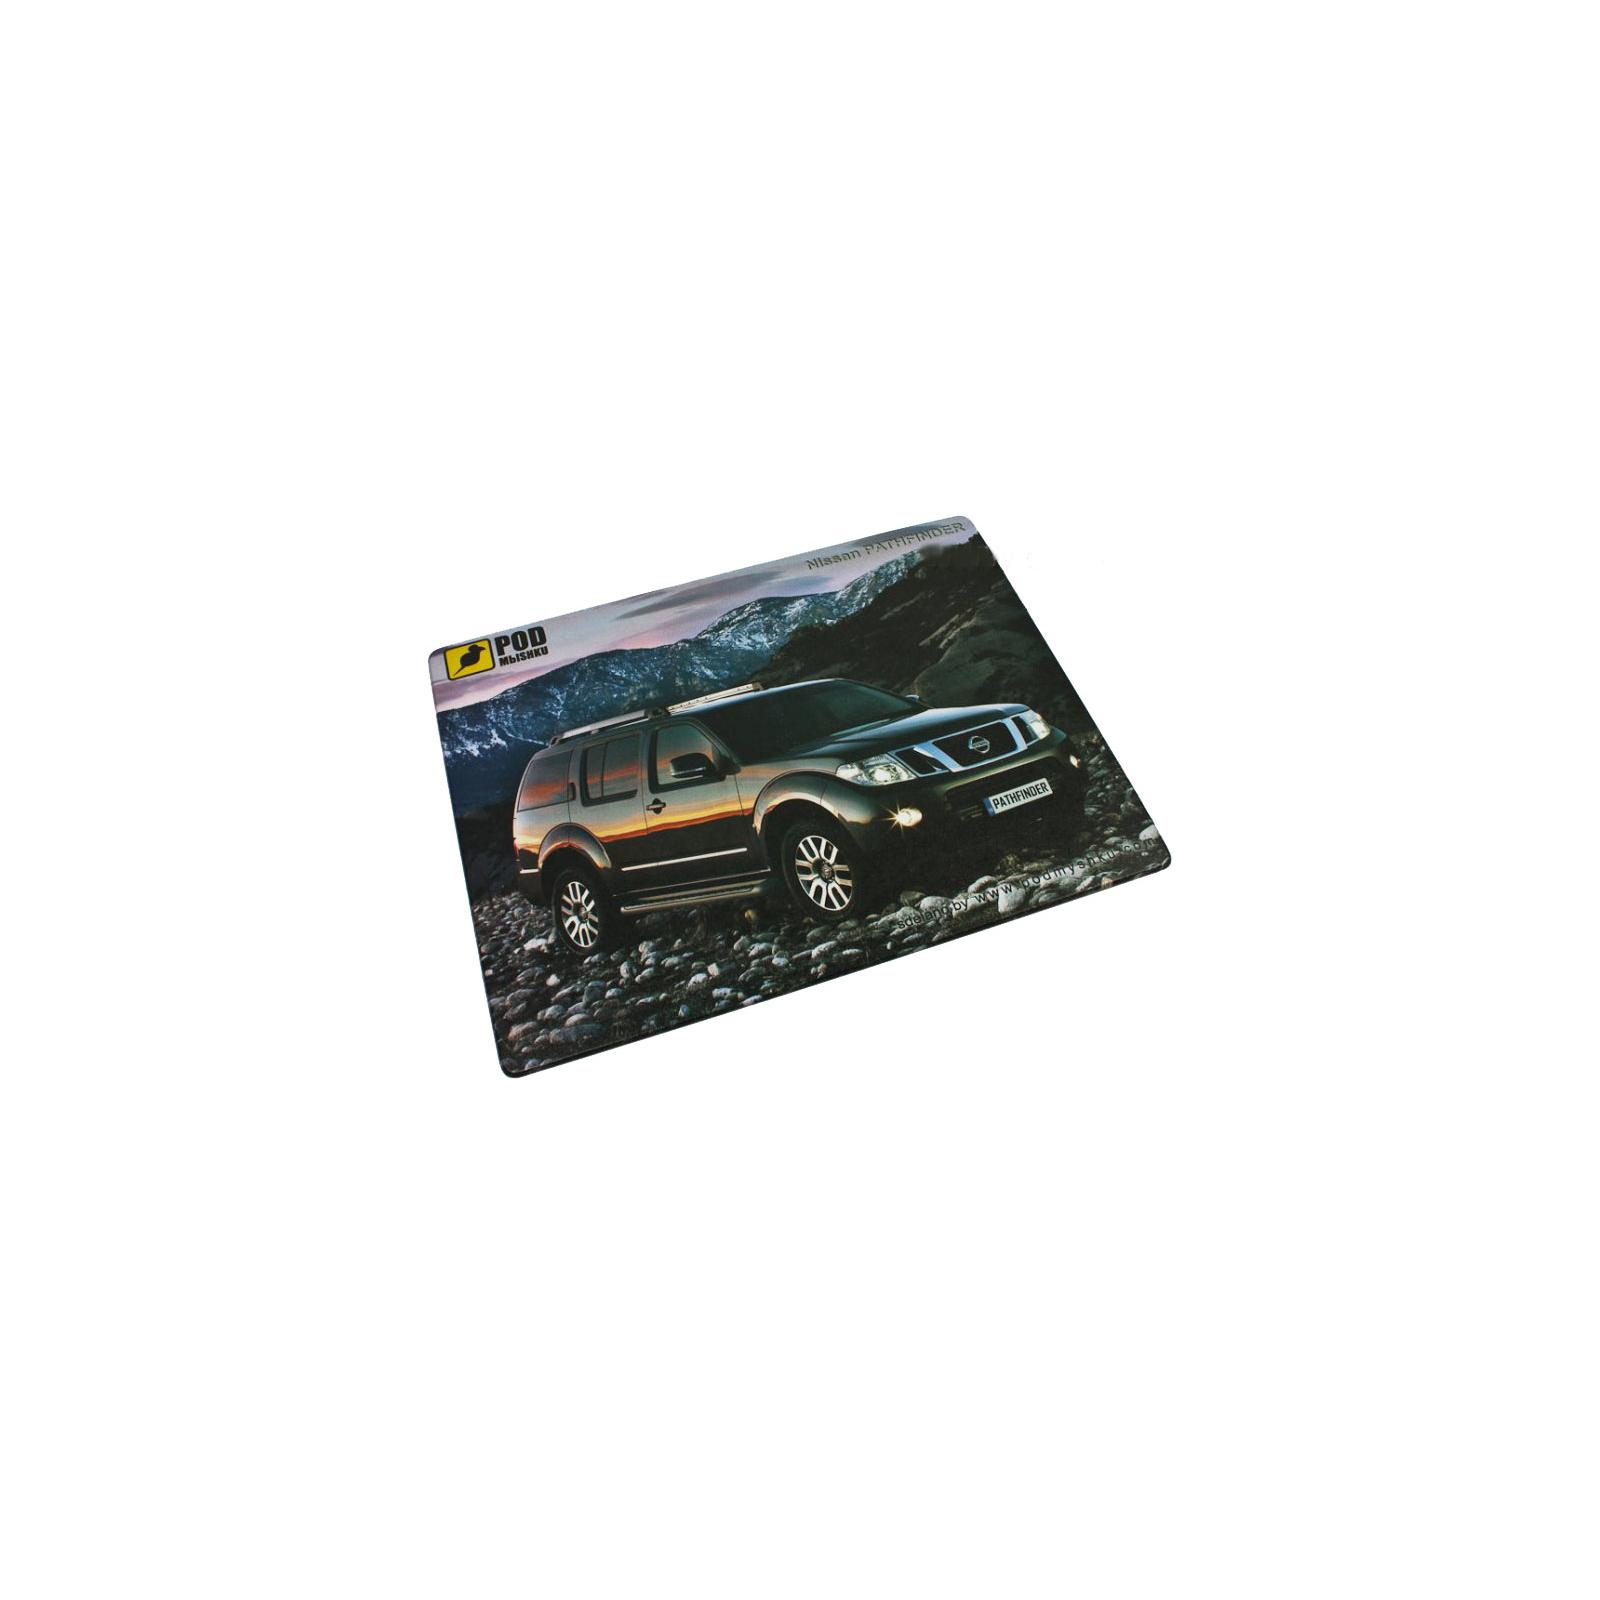 Коврик Pod Mishkou Nissan Pathfinder